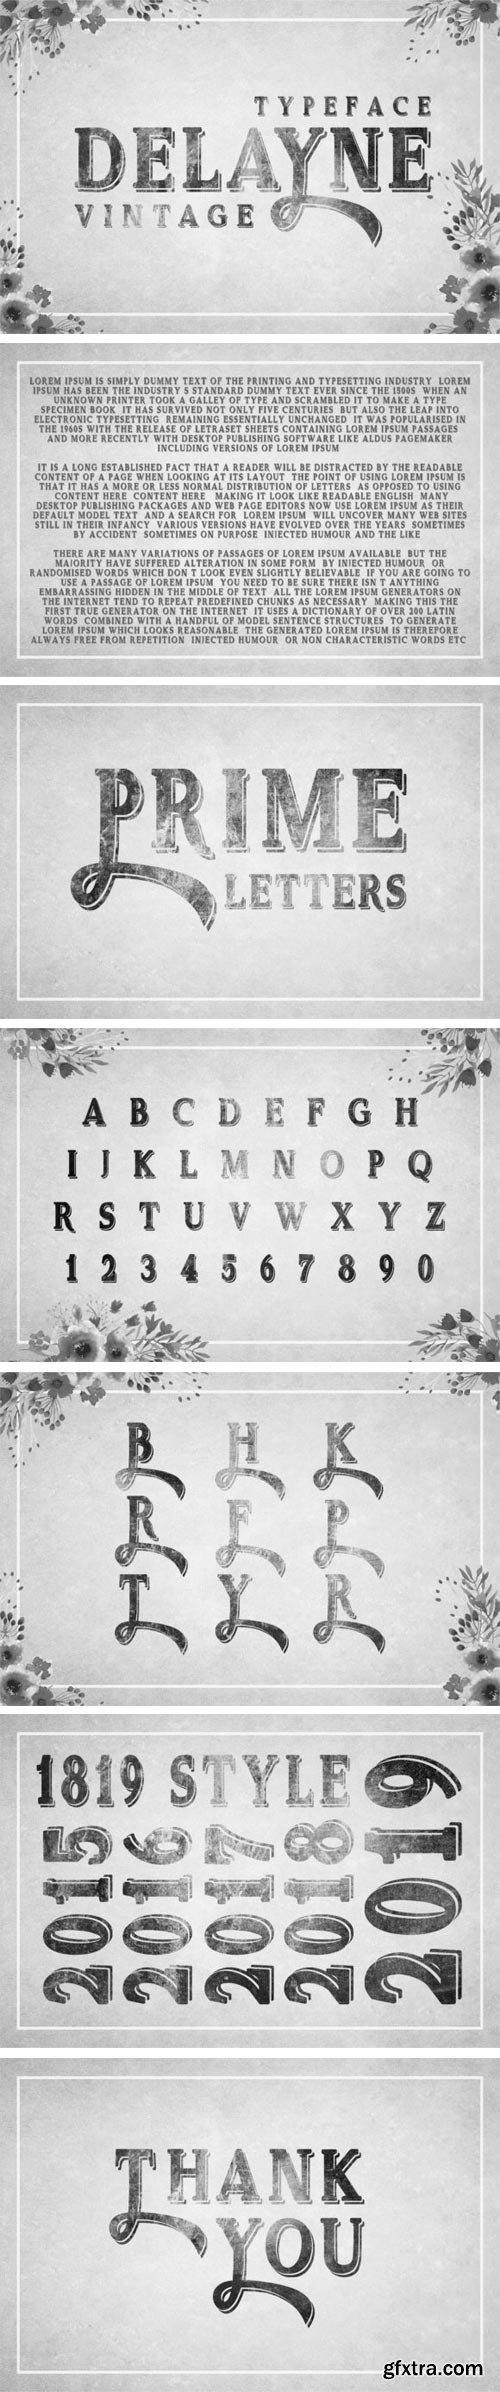 Delayne Font